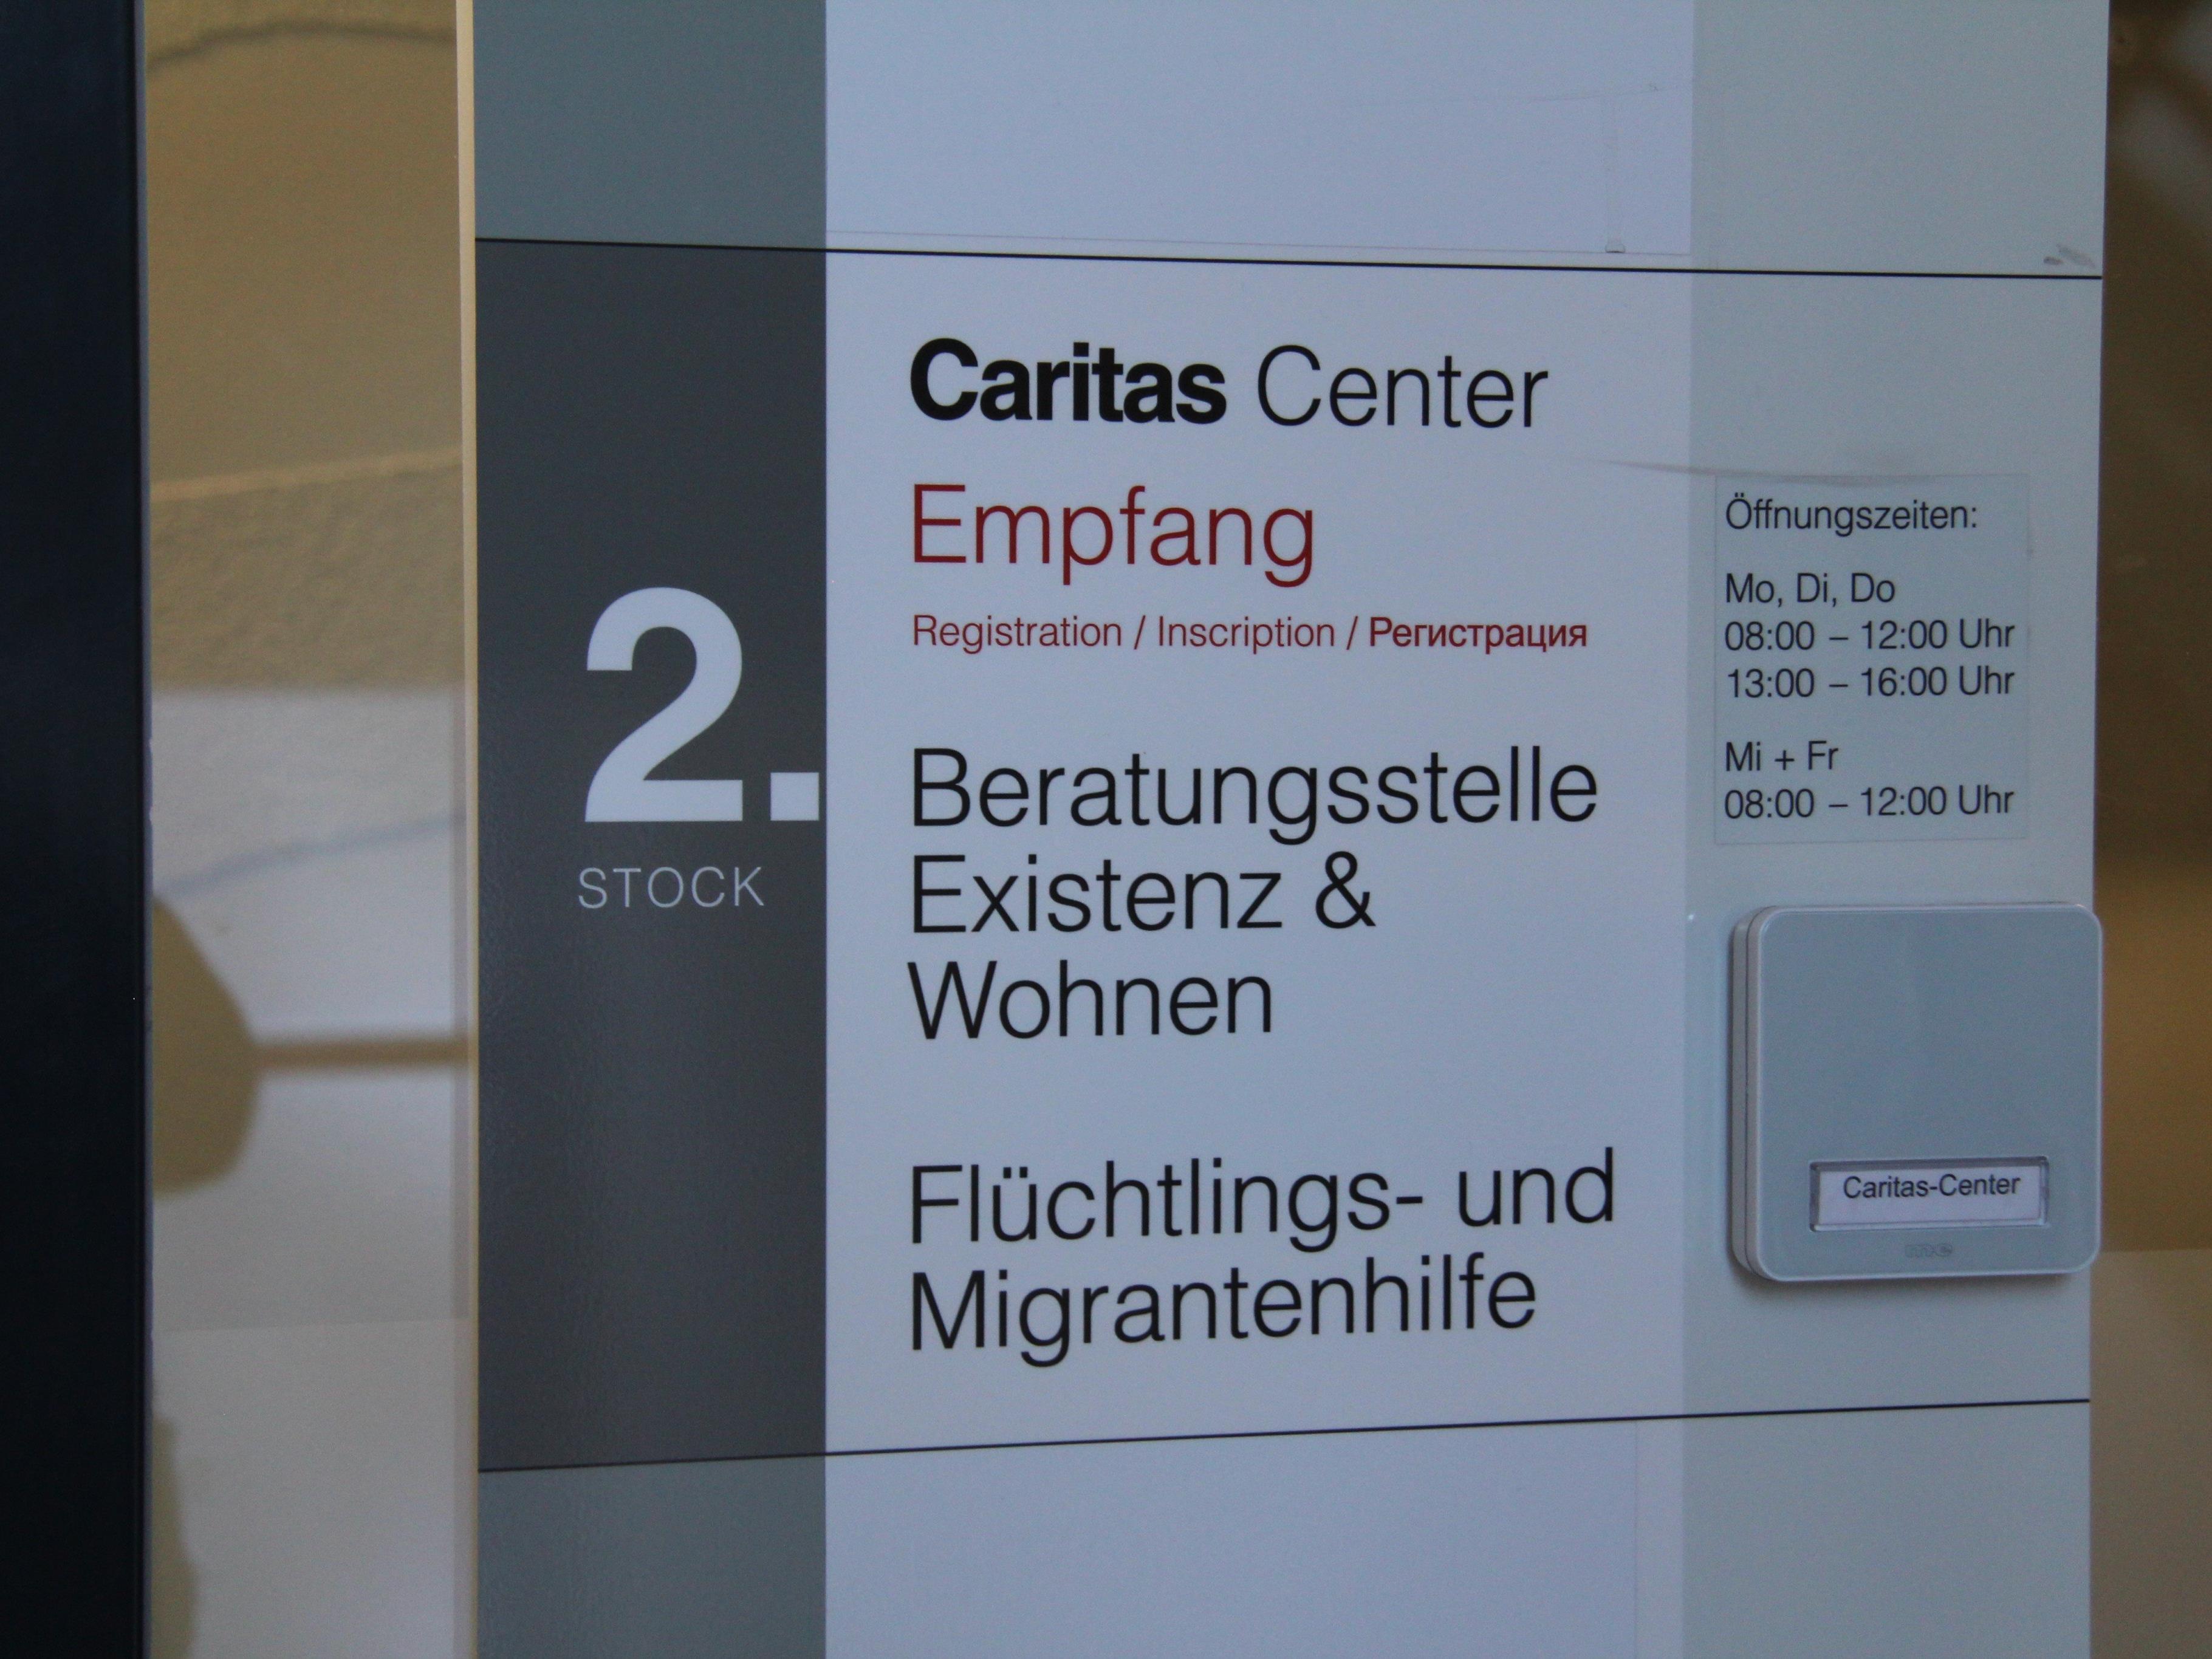 Die Caritas reagiert auf sinkende Flüchtlingszahlen.